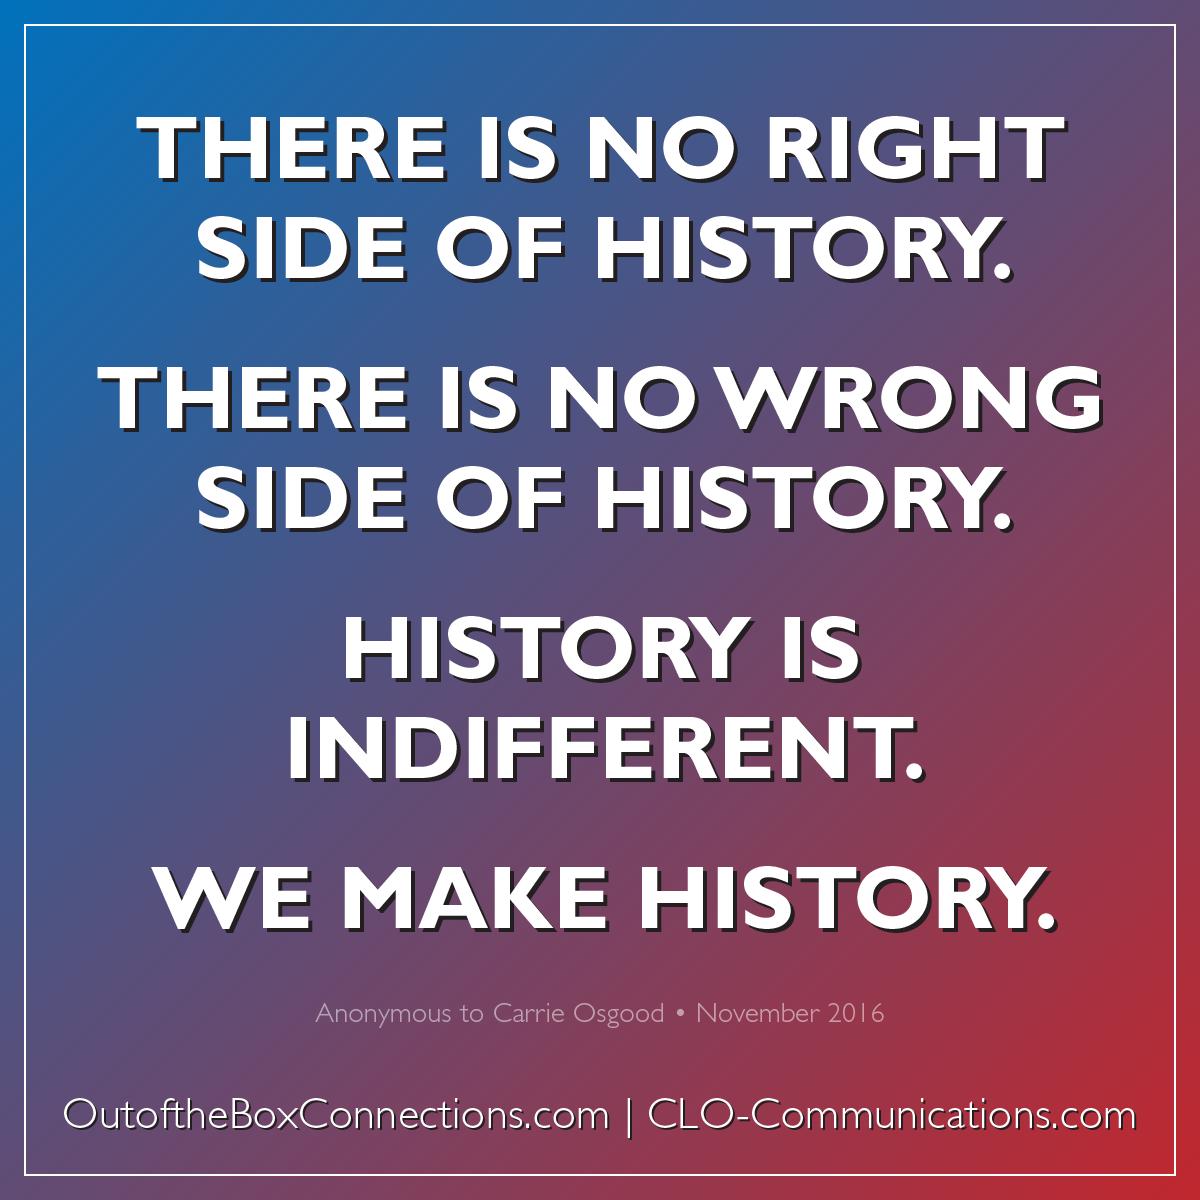 We make history.